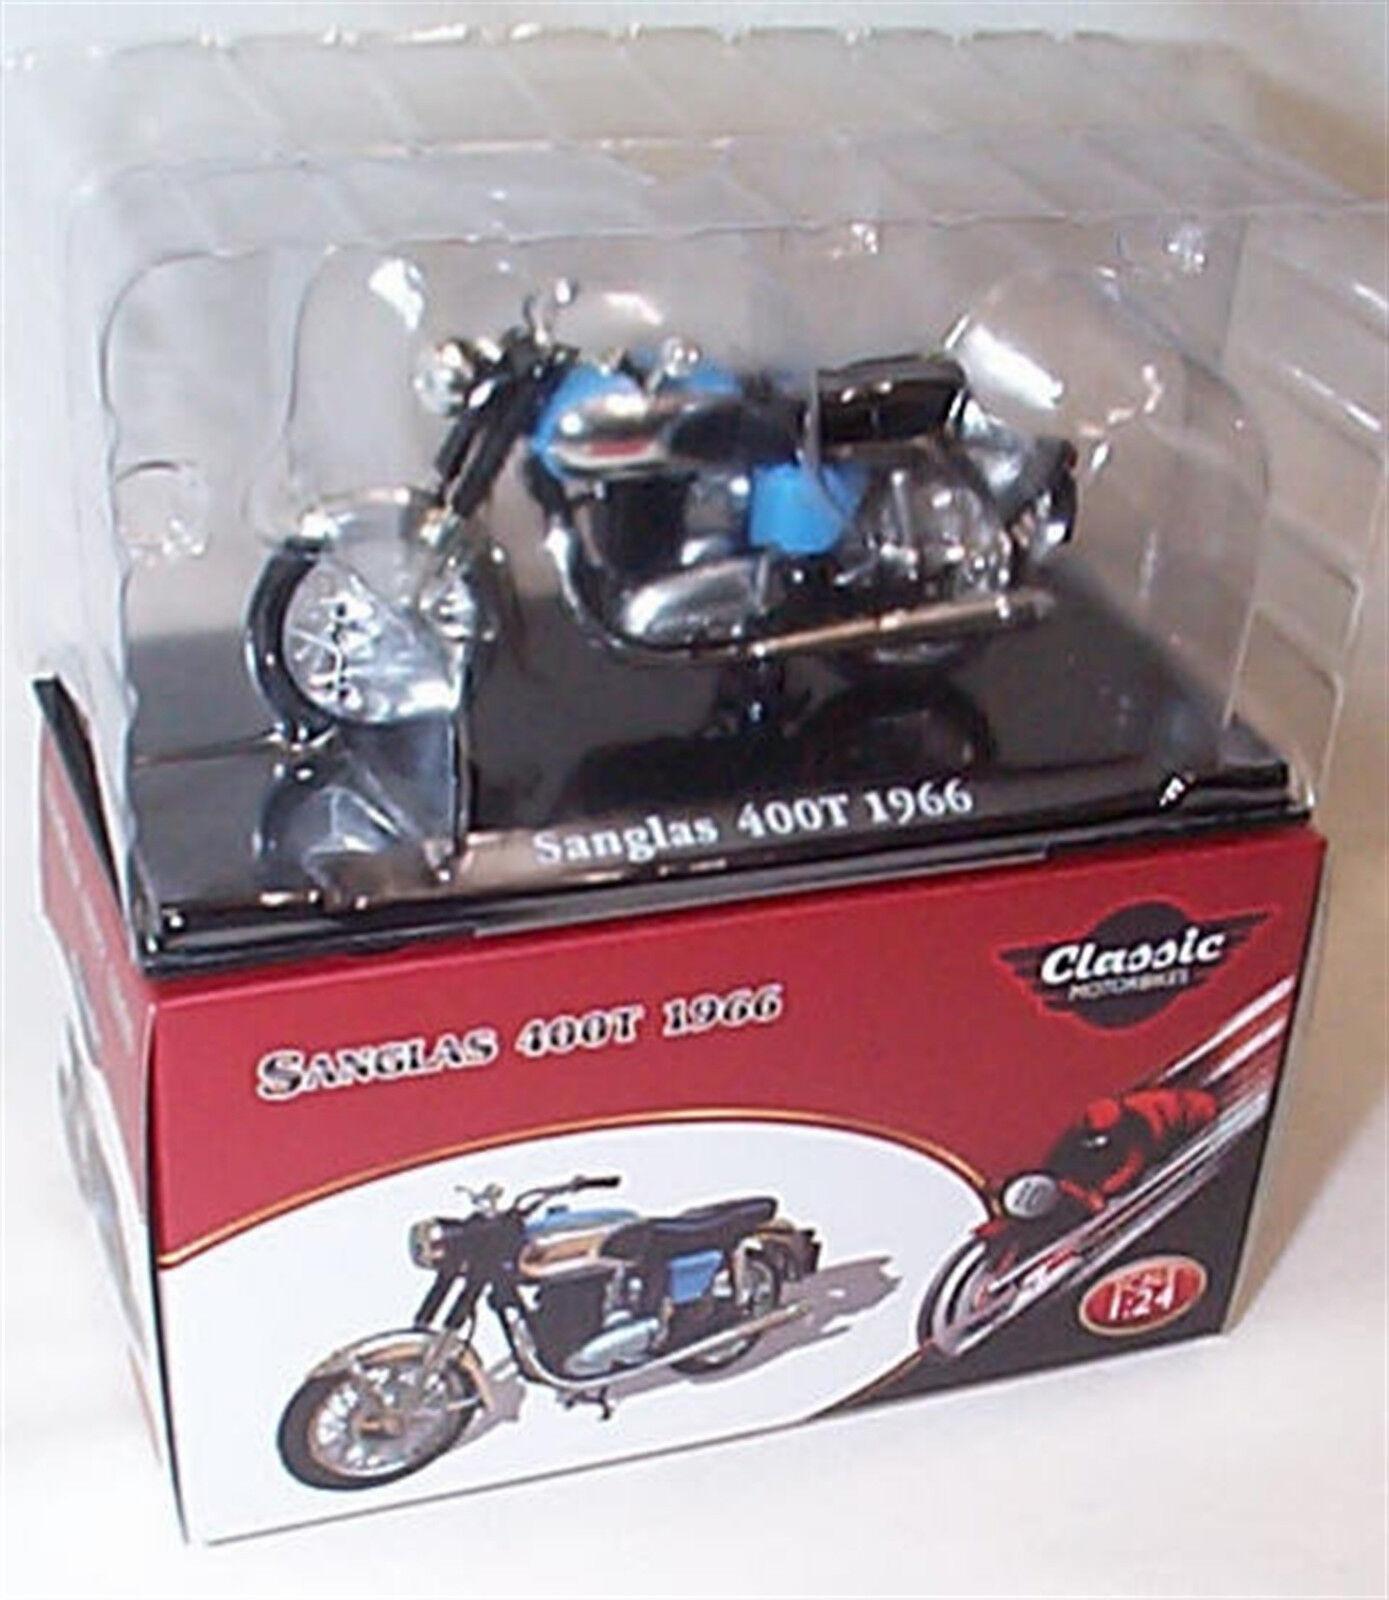 Sanglas 400T 1966 Classic Motorbike 1-24 Scale New in Case Case Case Atlas f30b87